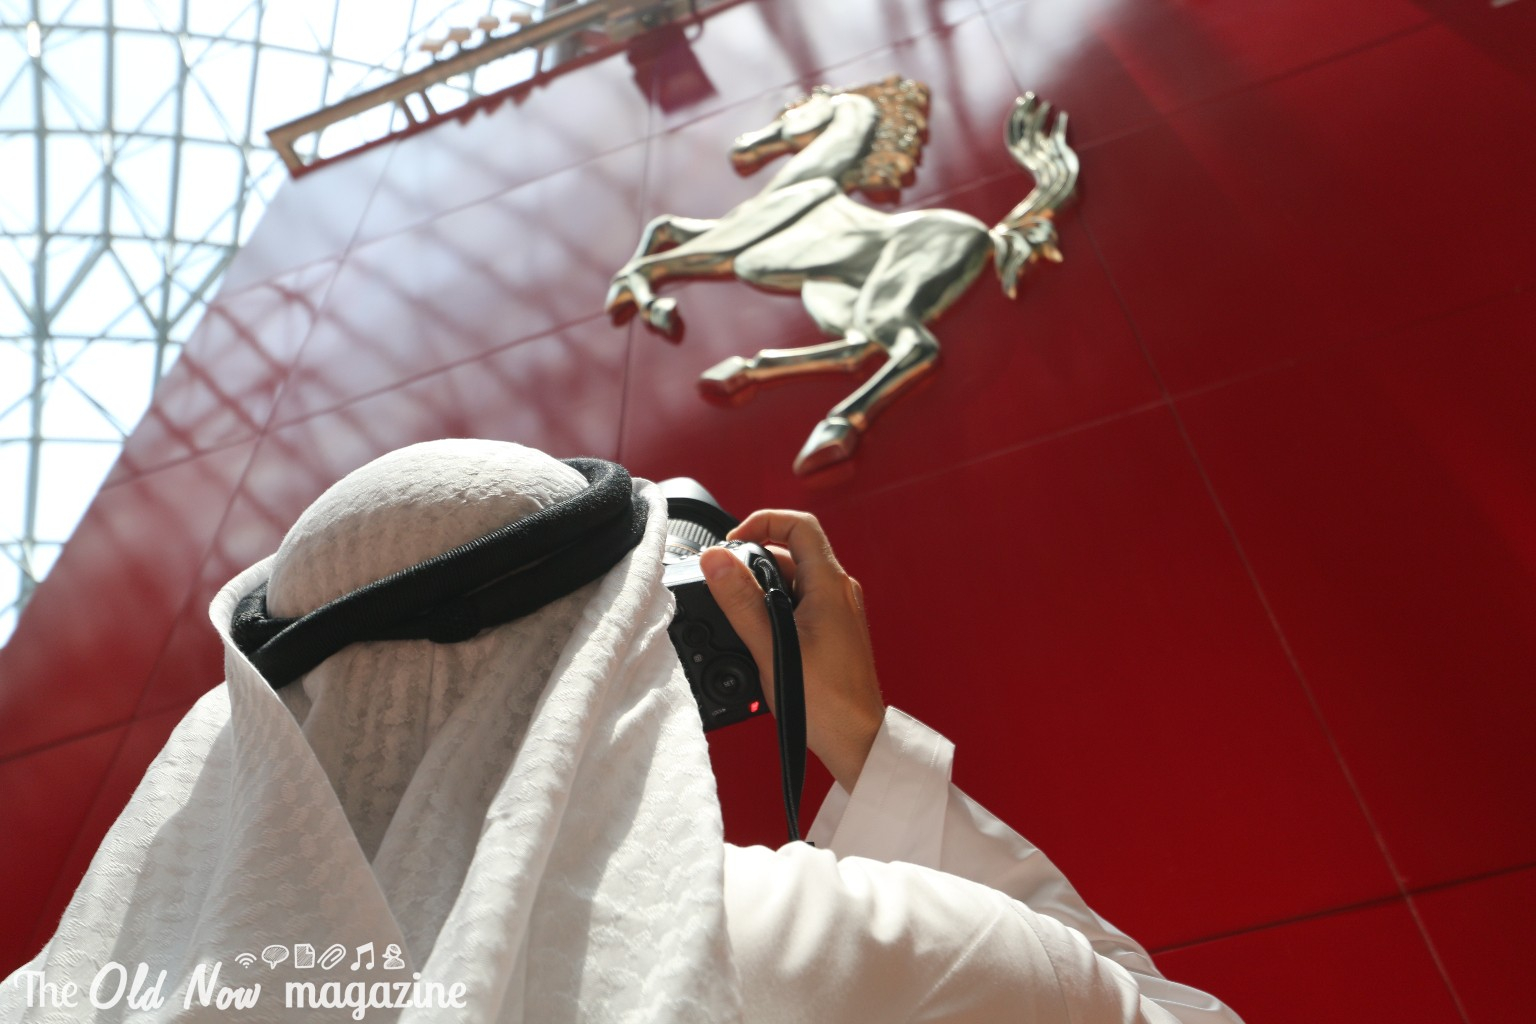 Abu-Dhabi-Ferrari-World-THEOLDNOW-12